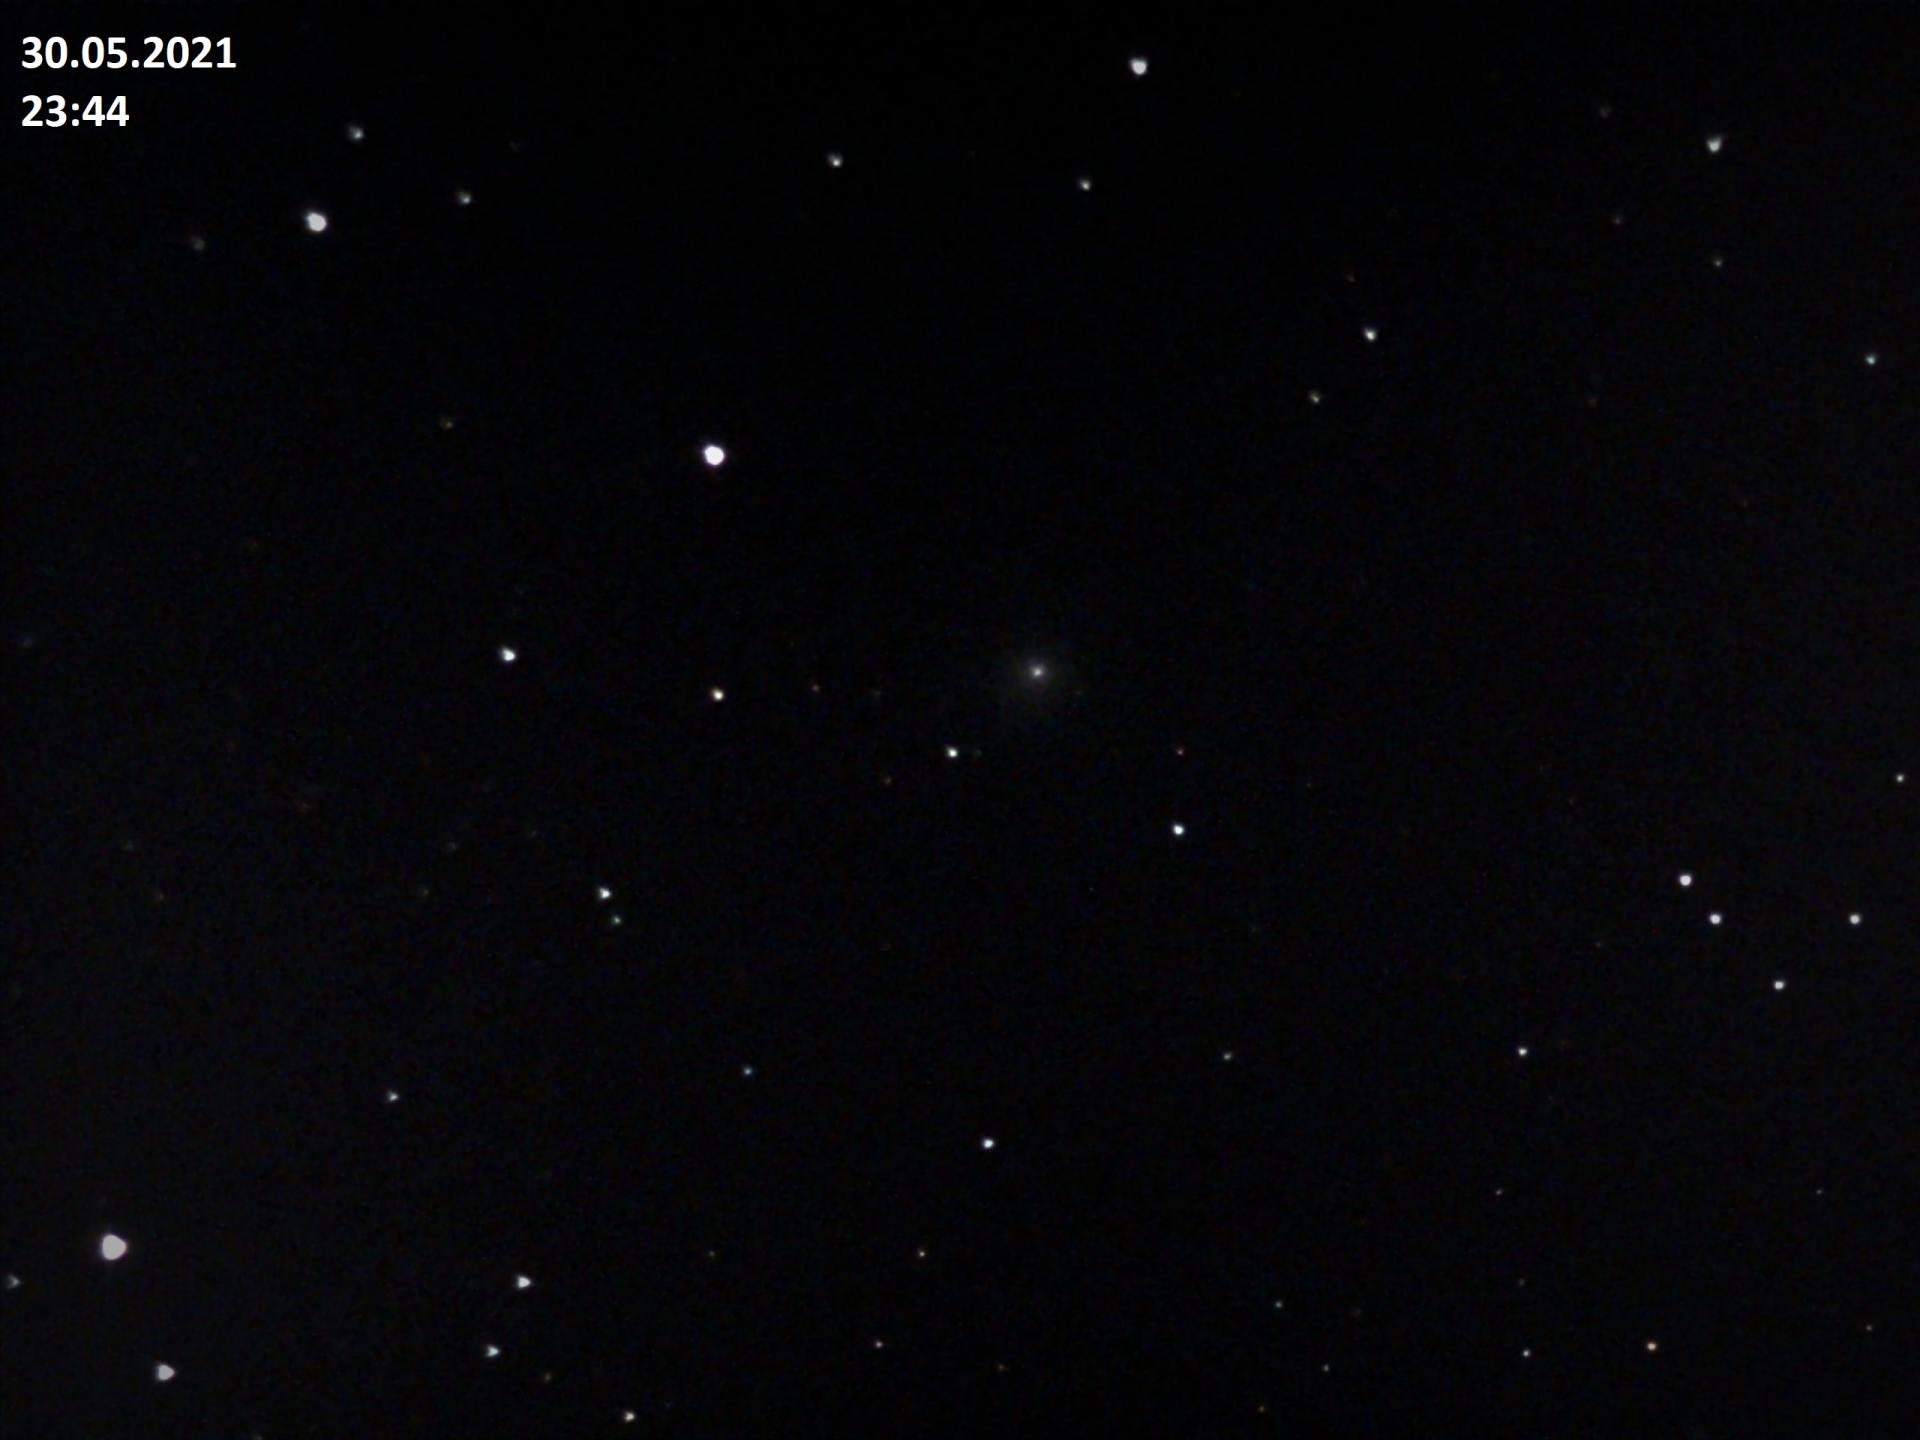 4 C2020 T2 Palomar eVscope-20210530-214405-1.png